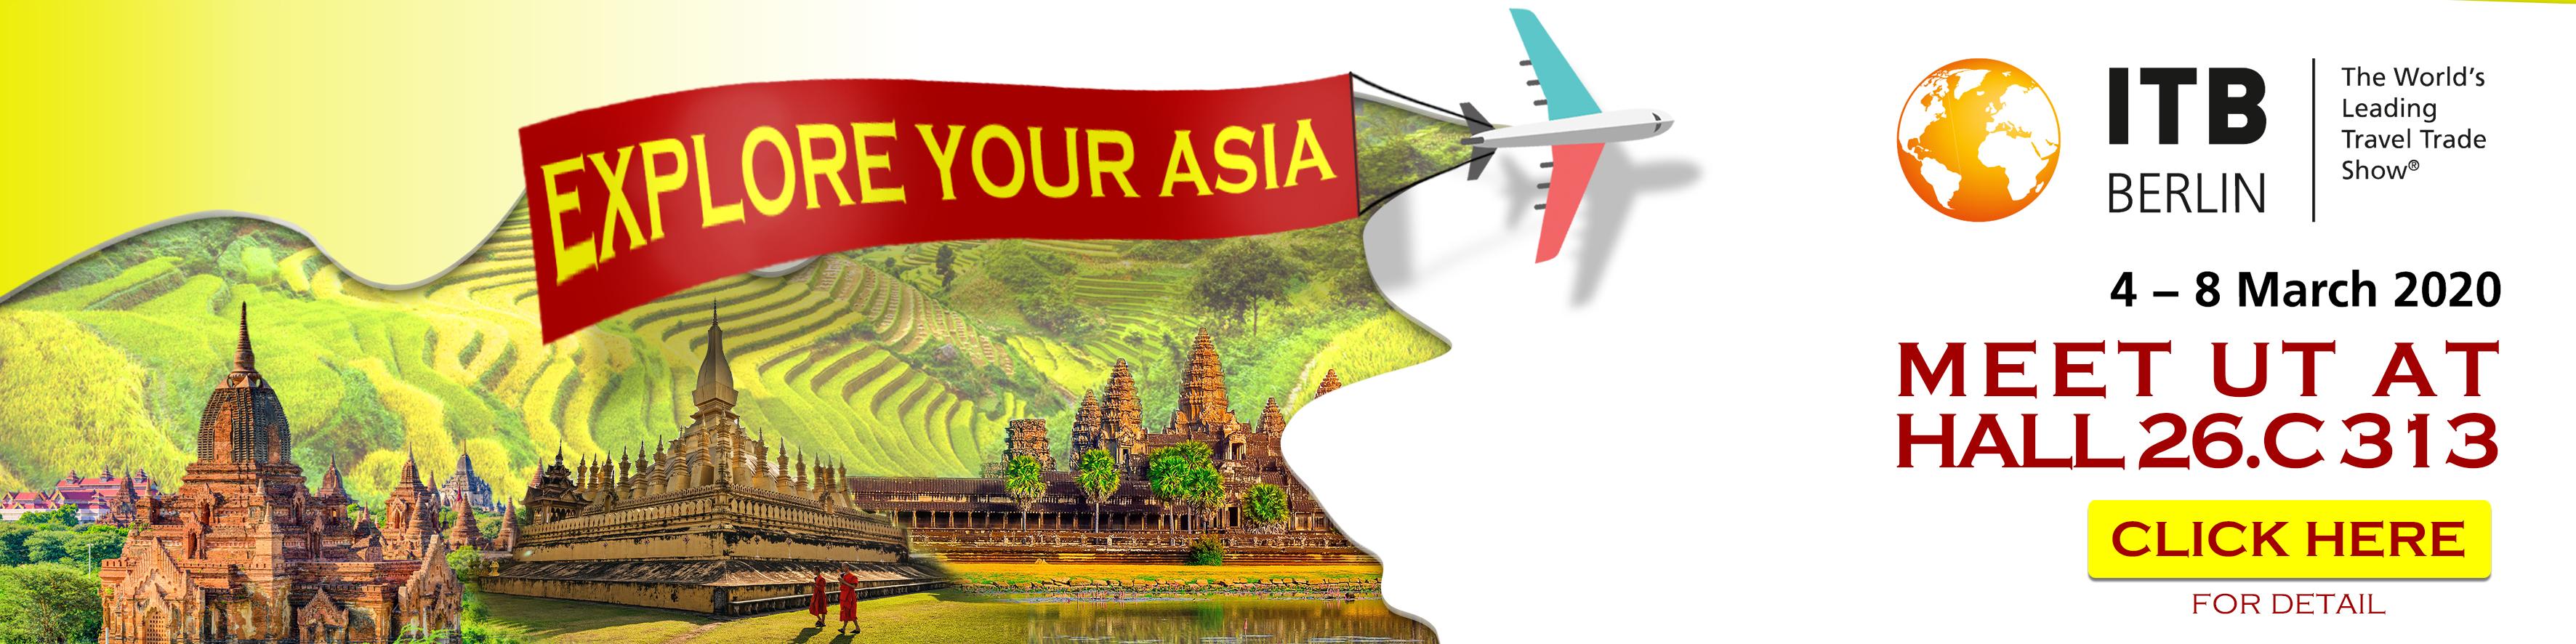 https://www.virtualmarket.itb-berlin.de/en/Indochina-Travelland,c604524